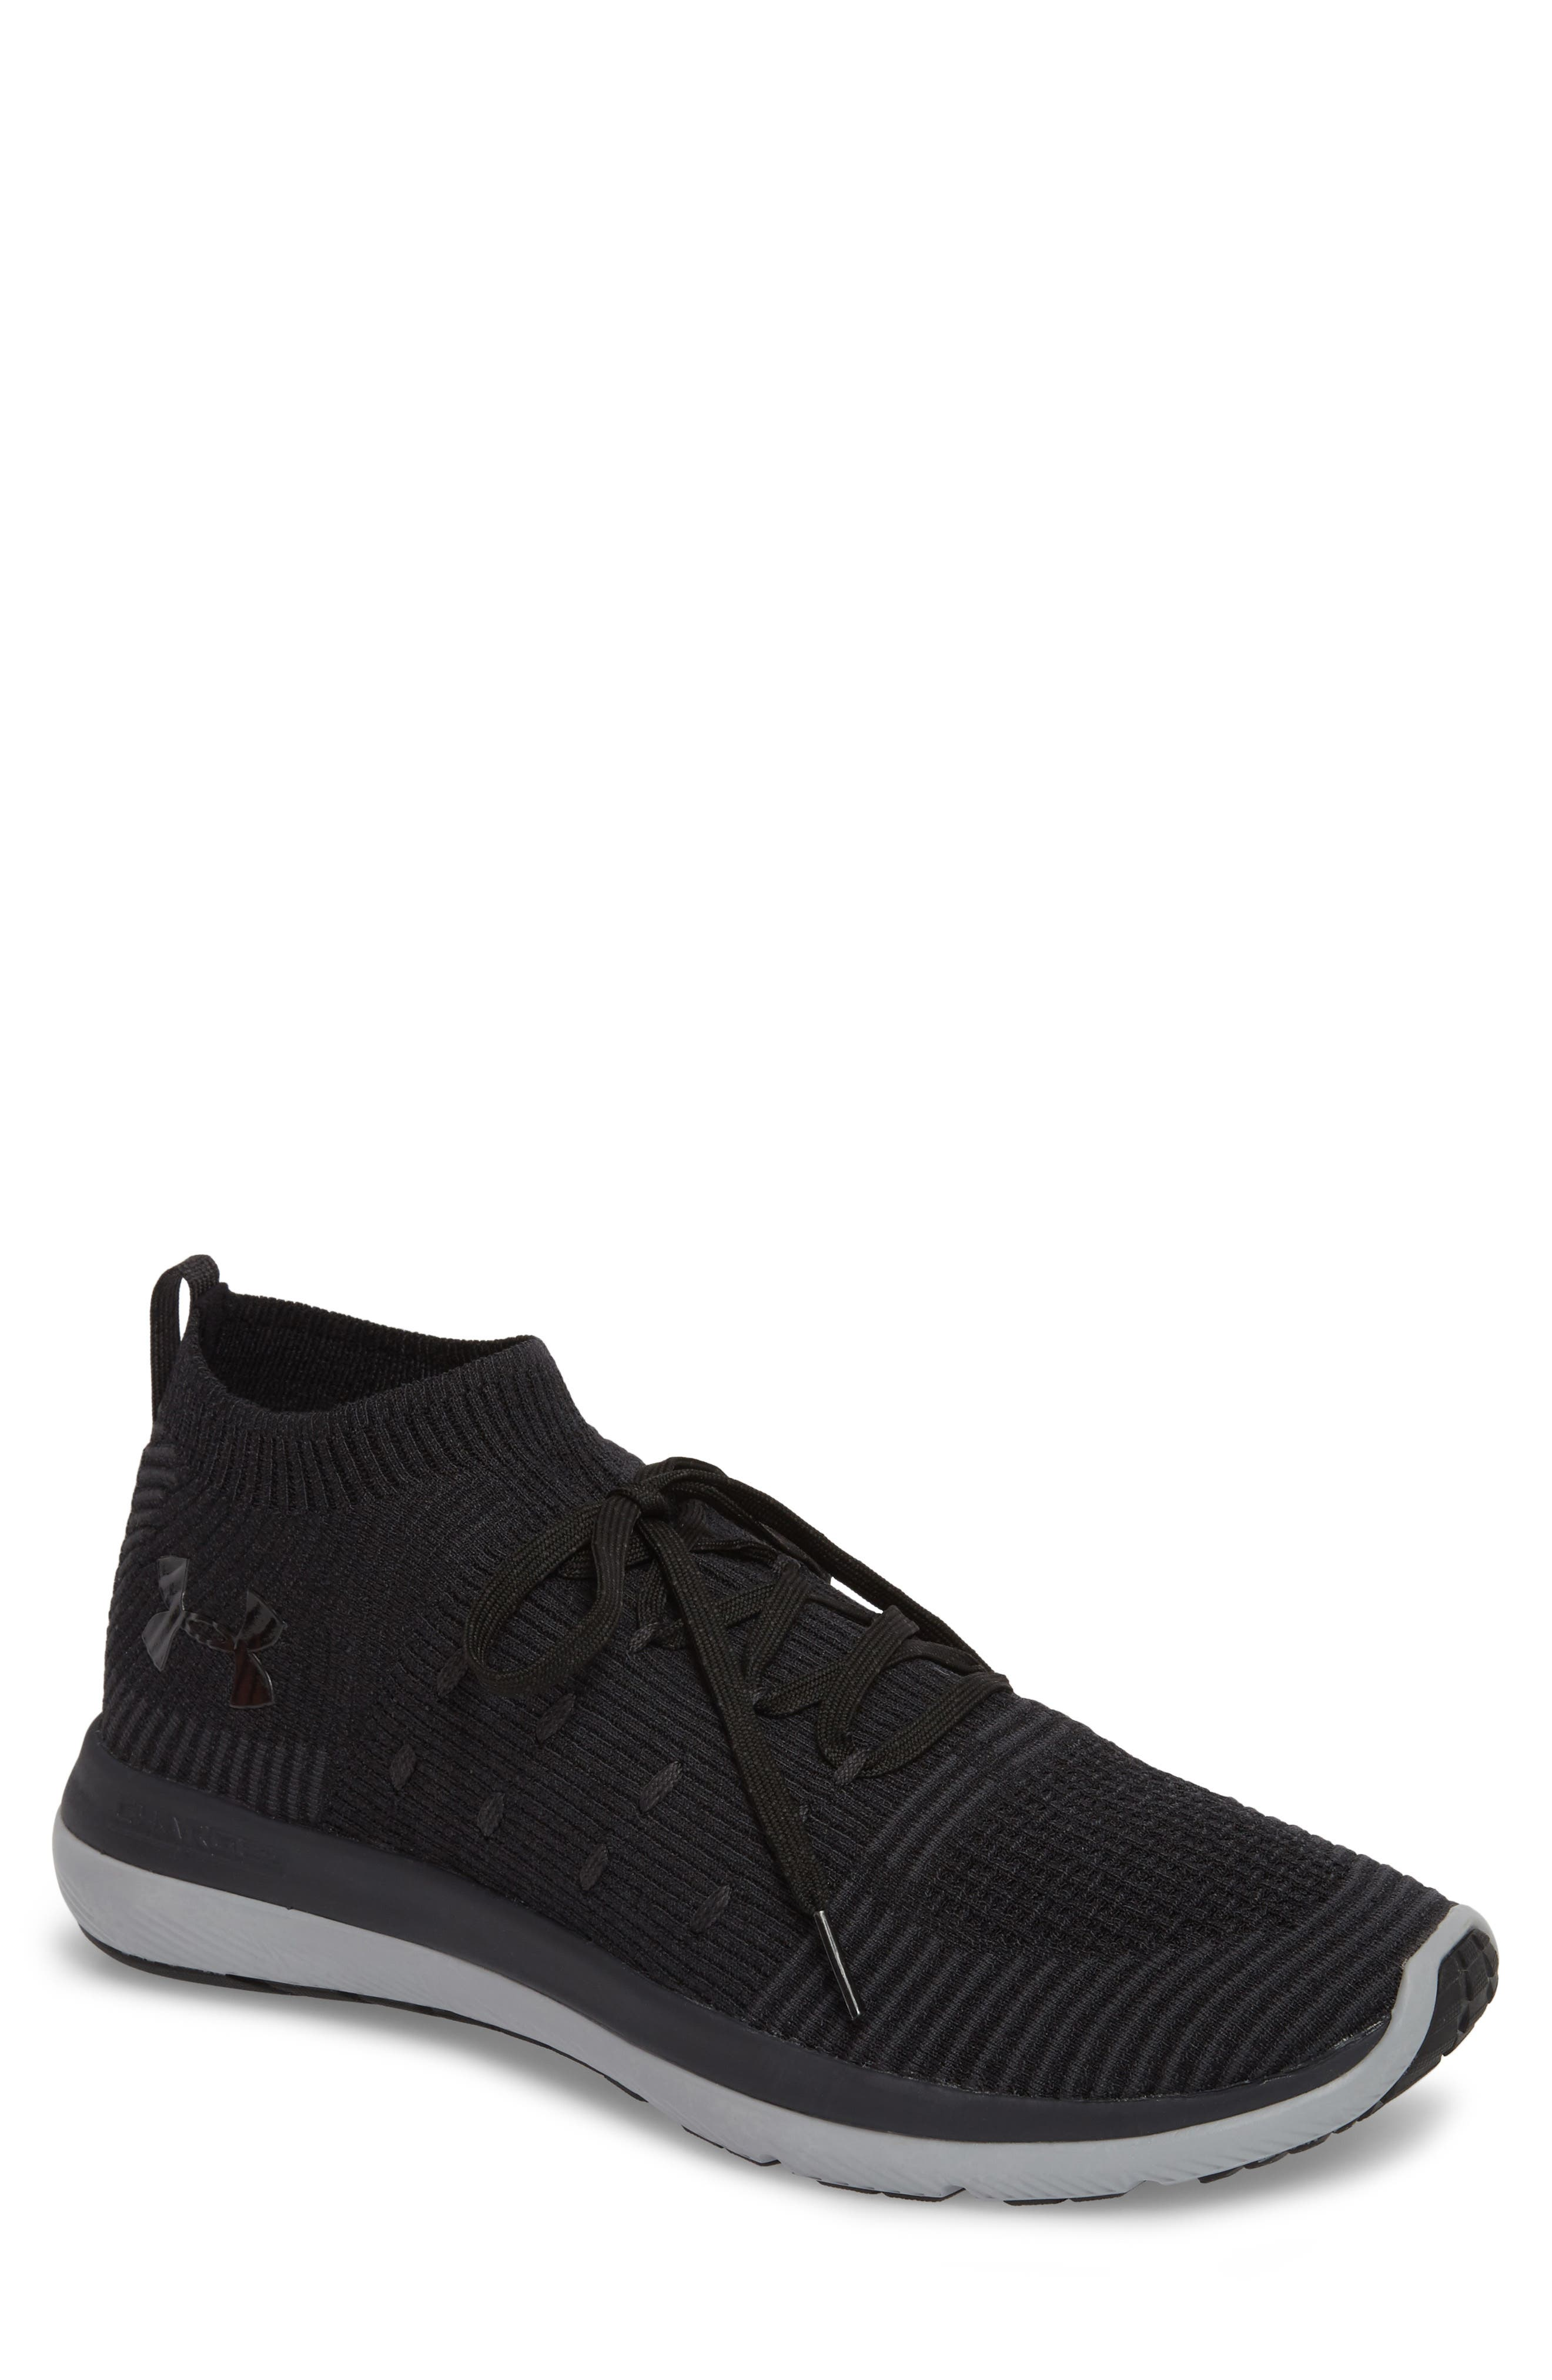 Slingflex Rise Sneaker,                             Main thumbnail 1, color,                             BLACK / ANTHRACITE / BLACK